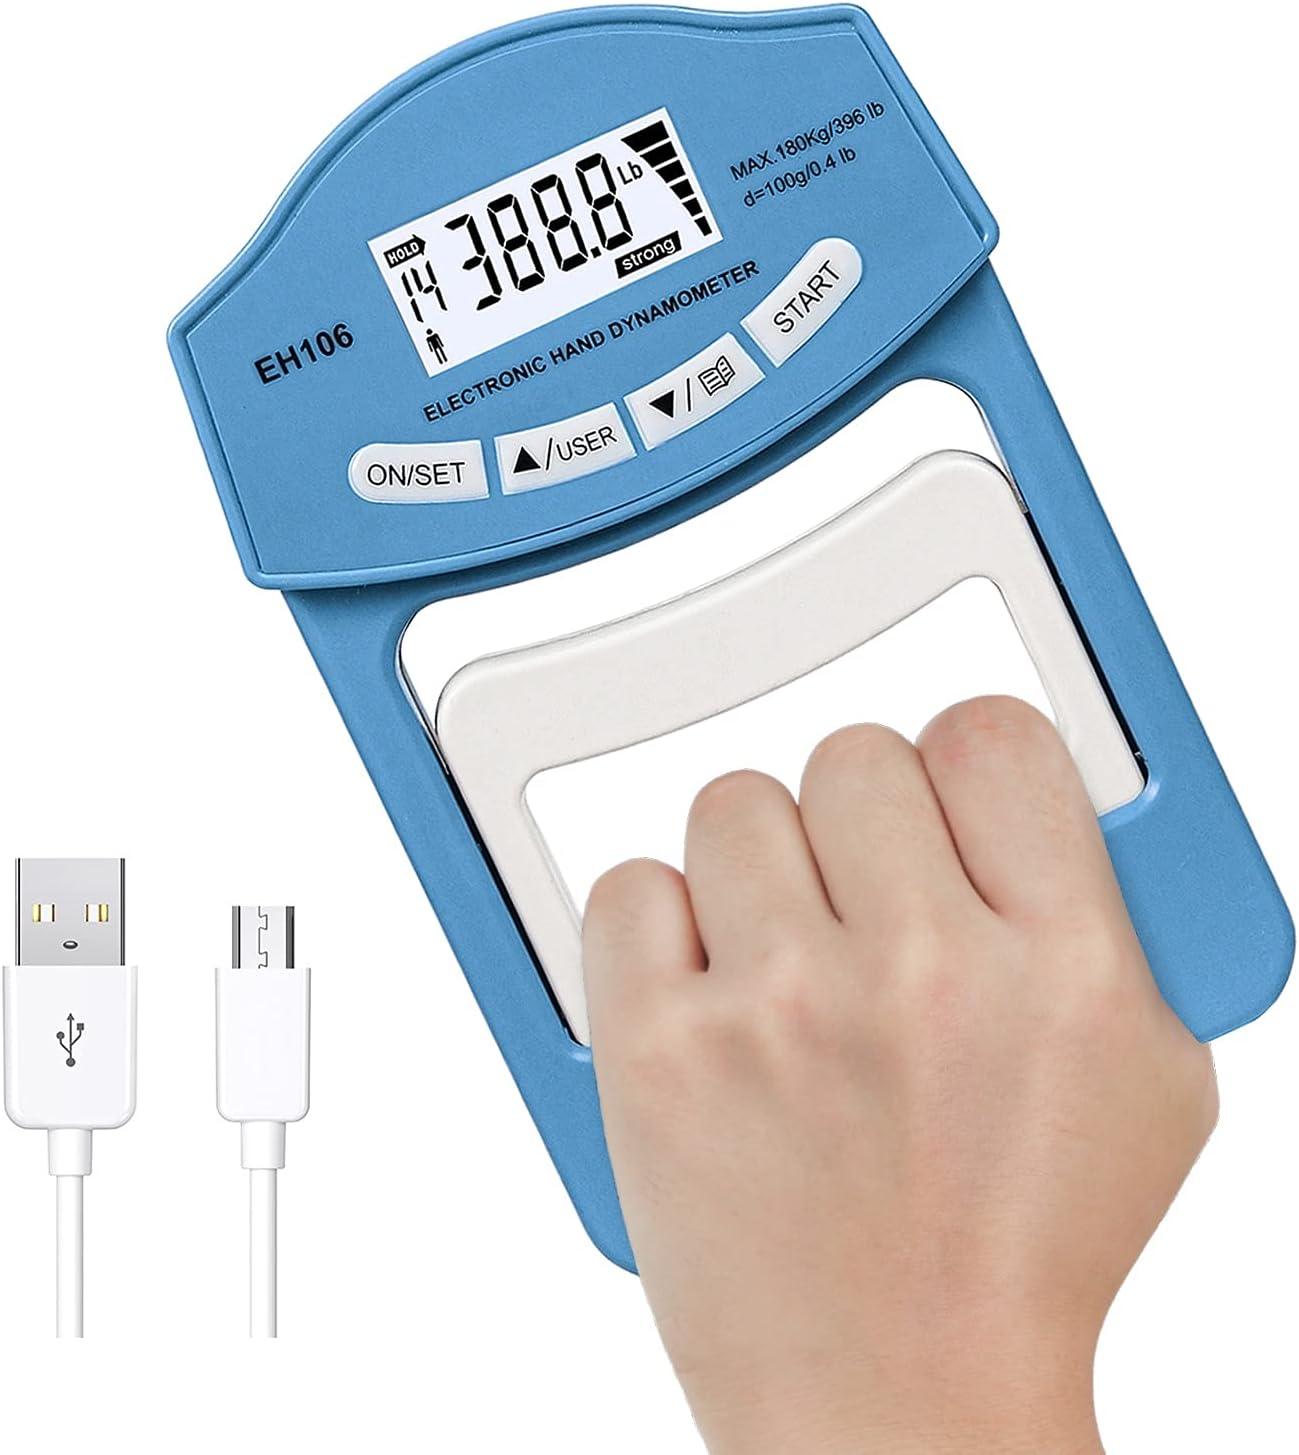 396 Lbs 180 Kgs Power Nippon regular agency Max 55% OFF USB Digital Strength Dynamo Grip Tester